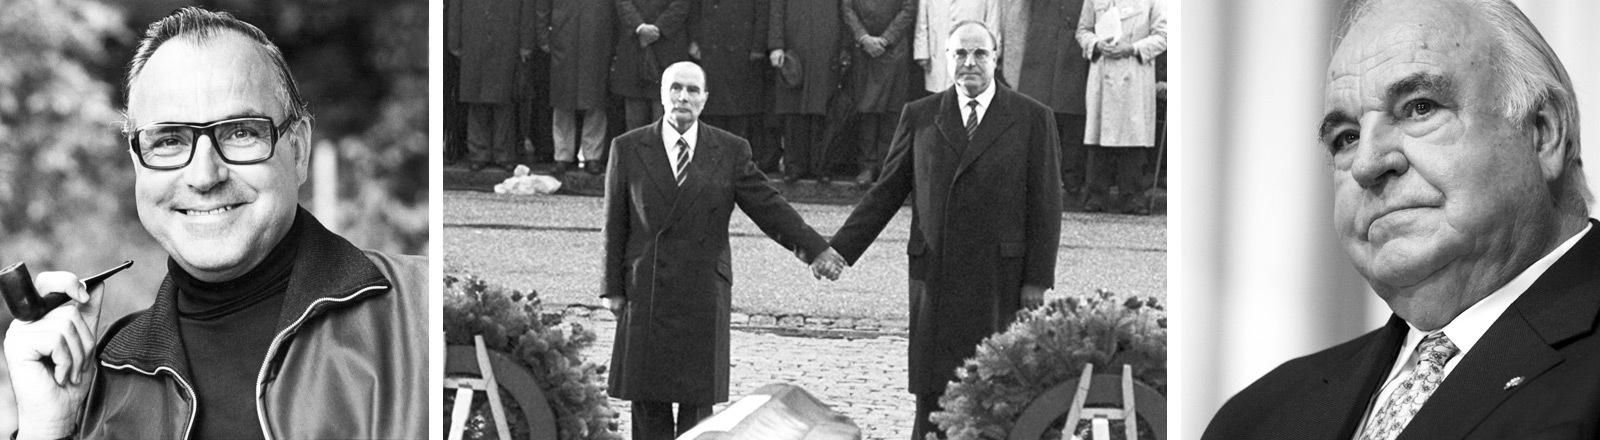 Altbundeskanzler Helmut Kohl.